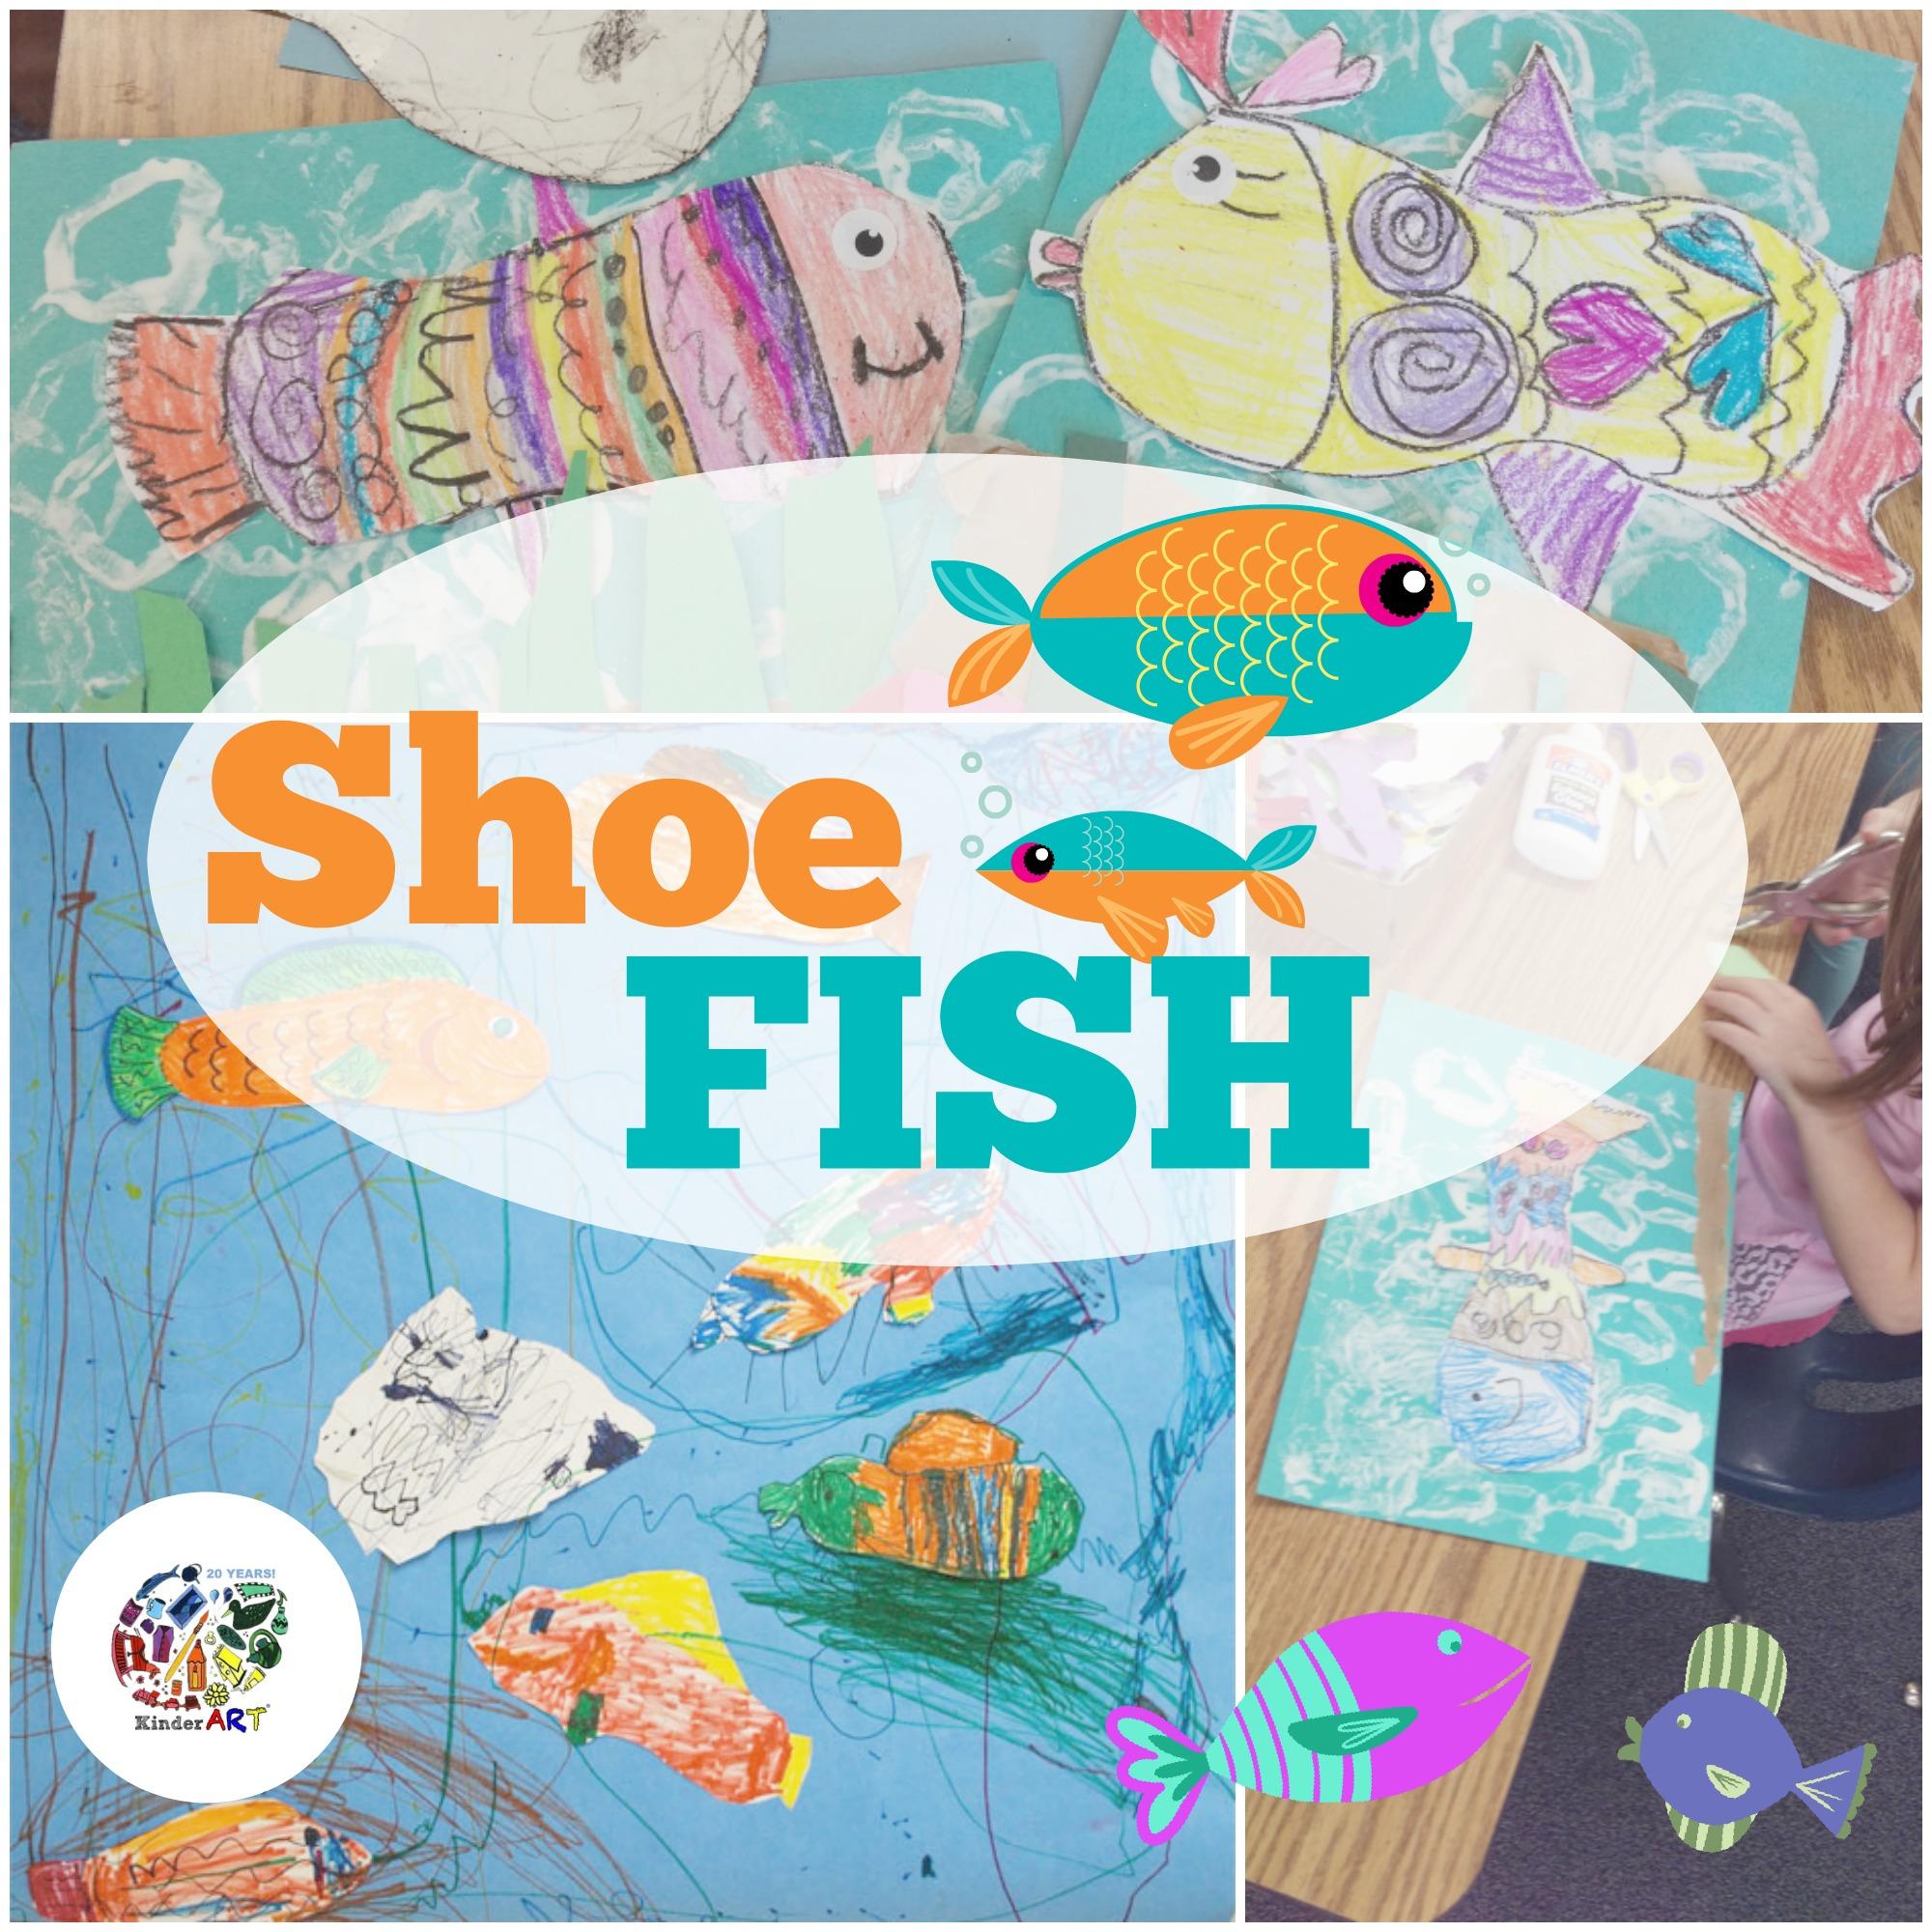 shoe_fish